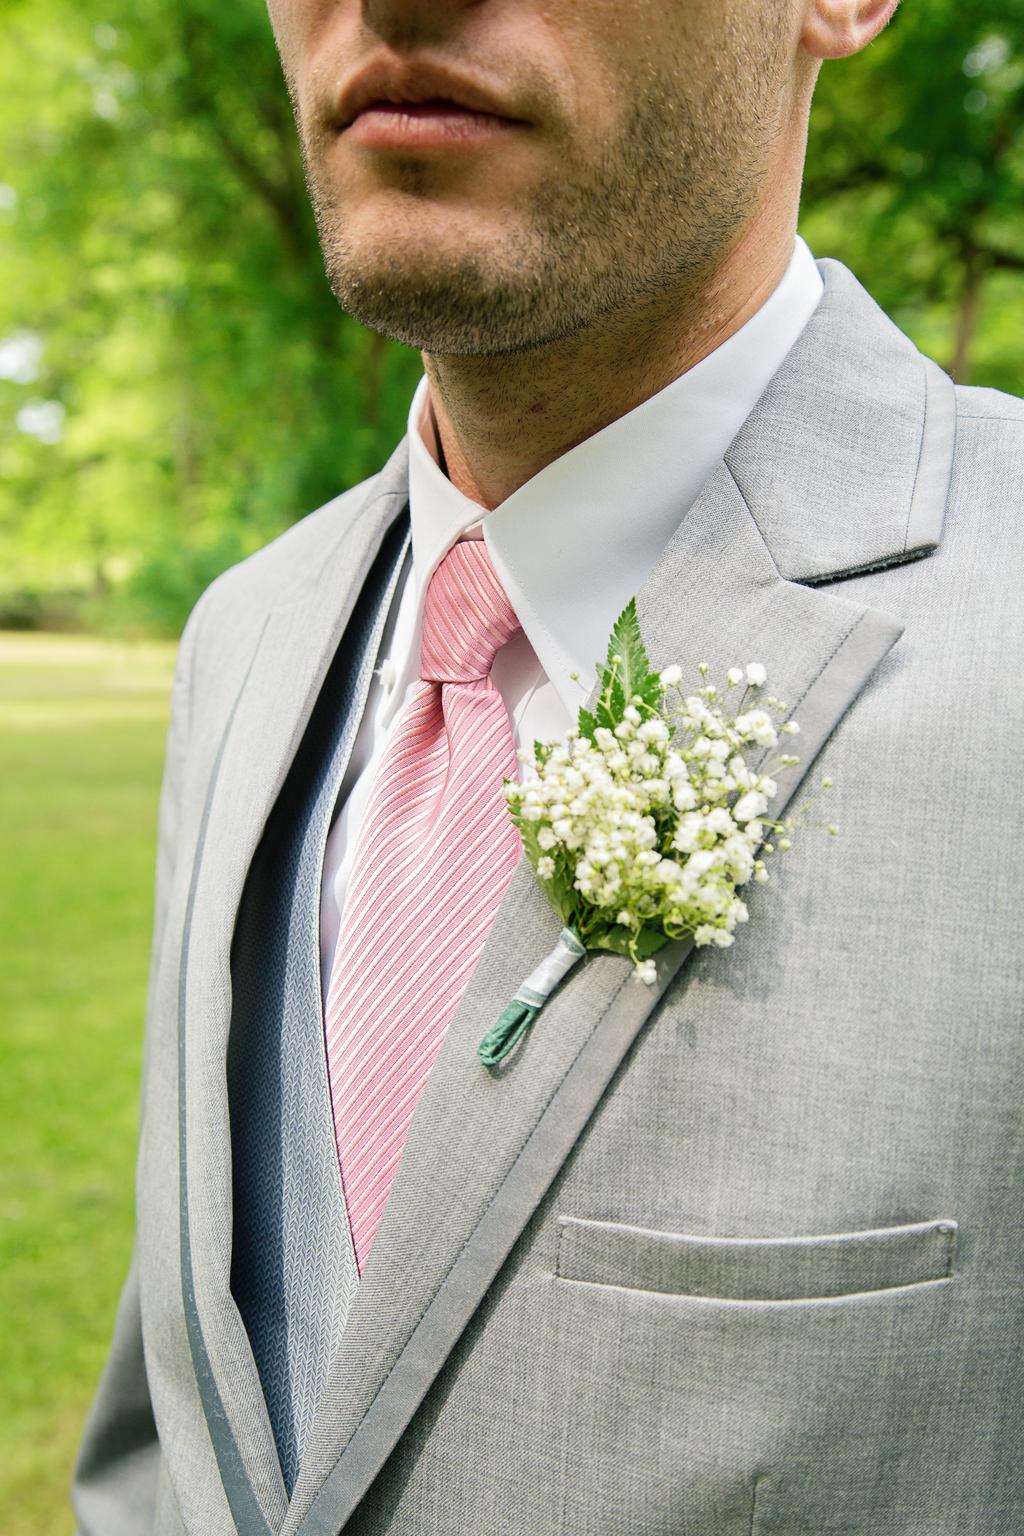 St-louis-wedding-photographer-wedding-photography-by-betty-elaine-19.full